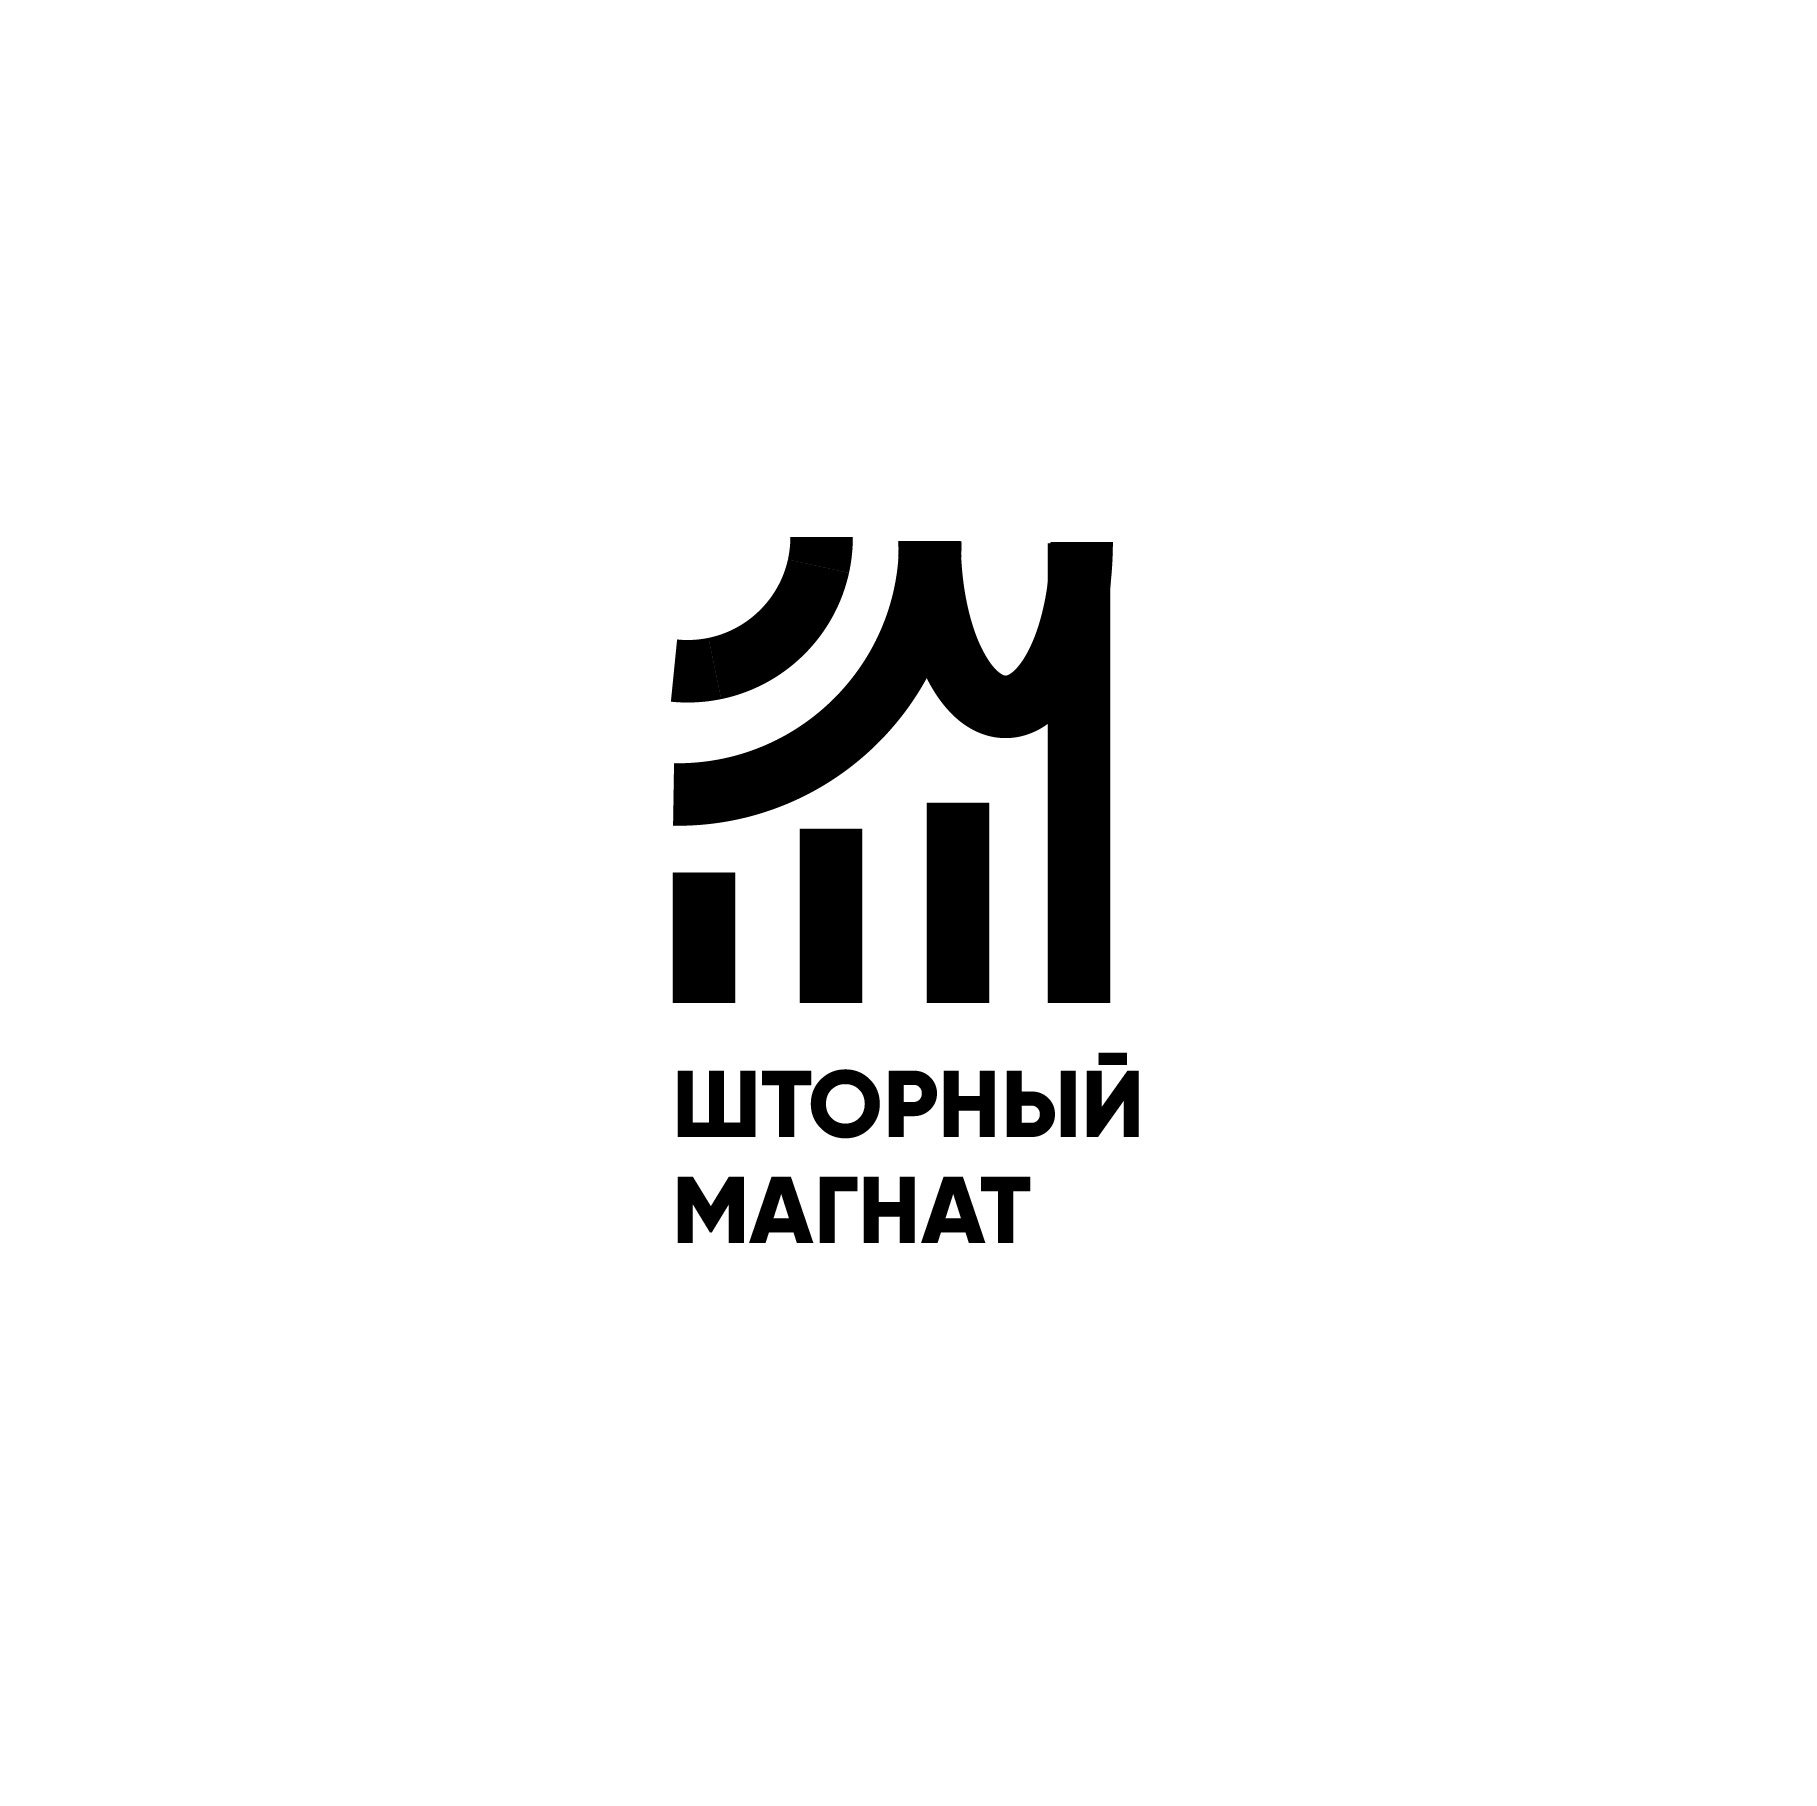 Логотип и фирменный стиль для магазина тканей. фото f_4335cd99ff3716aa.jpg